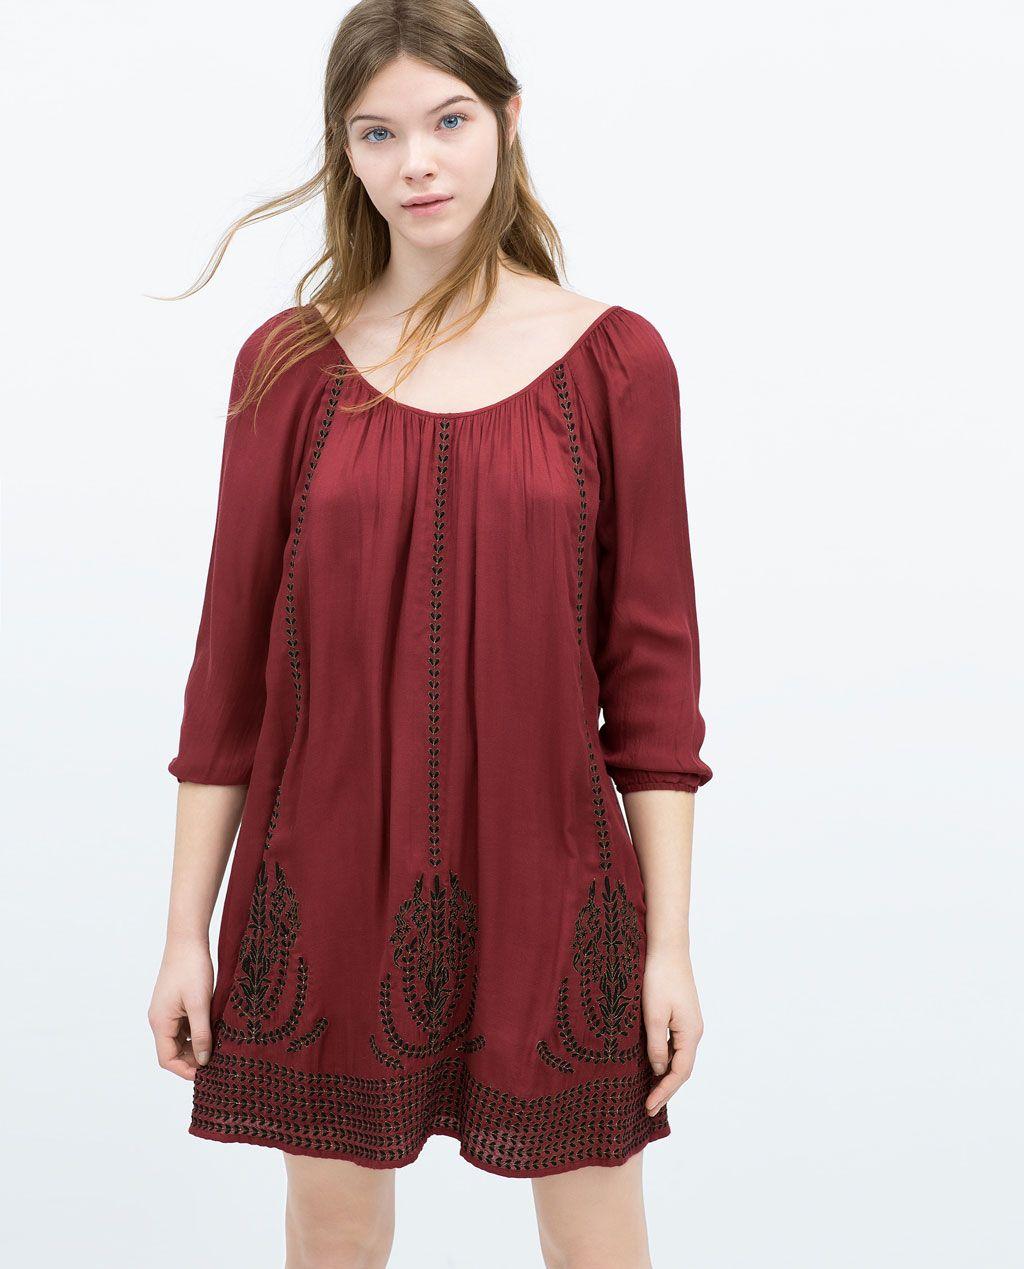 Zara mujer vestido bordado uac moda fashion style